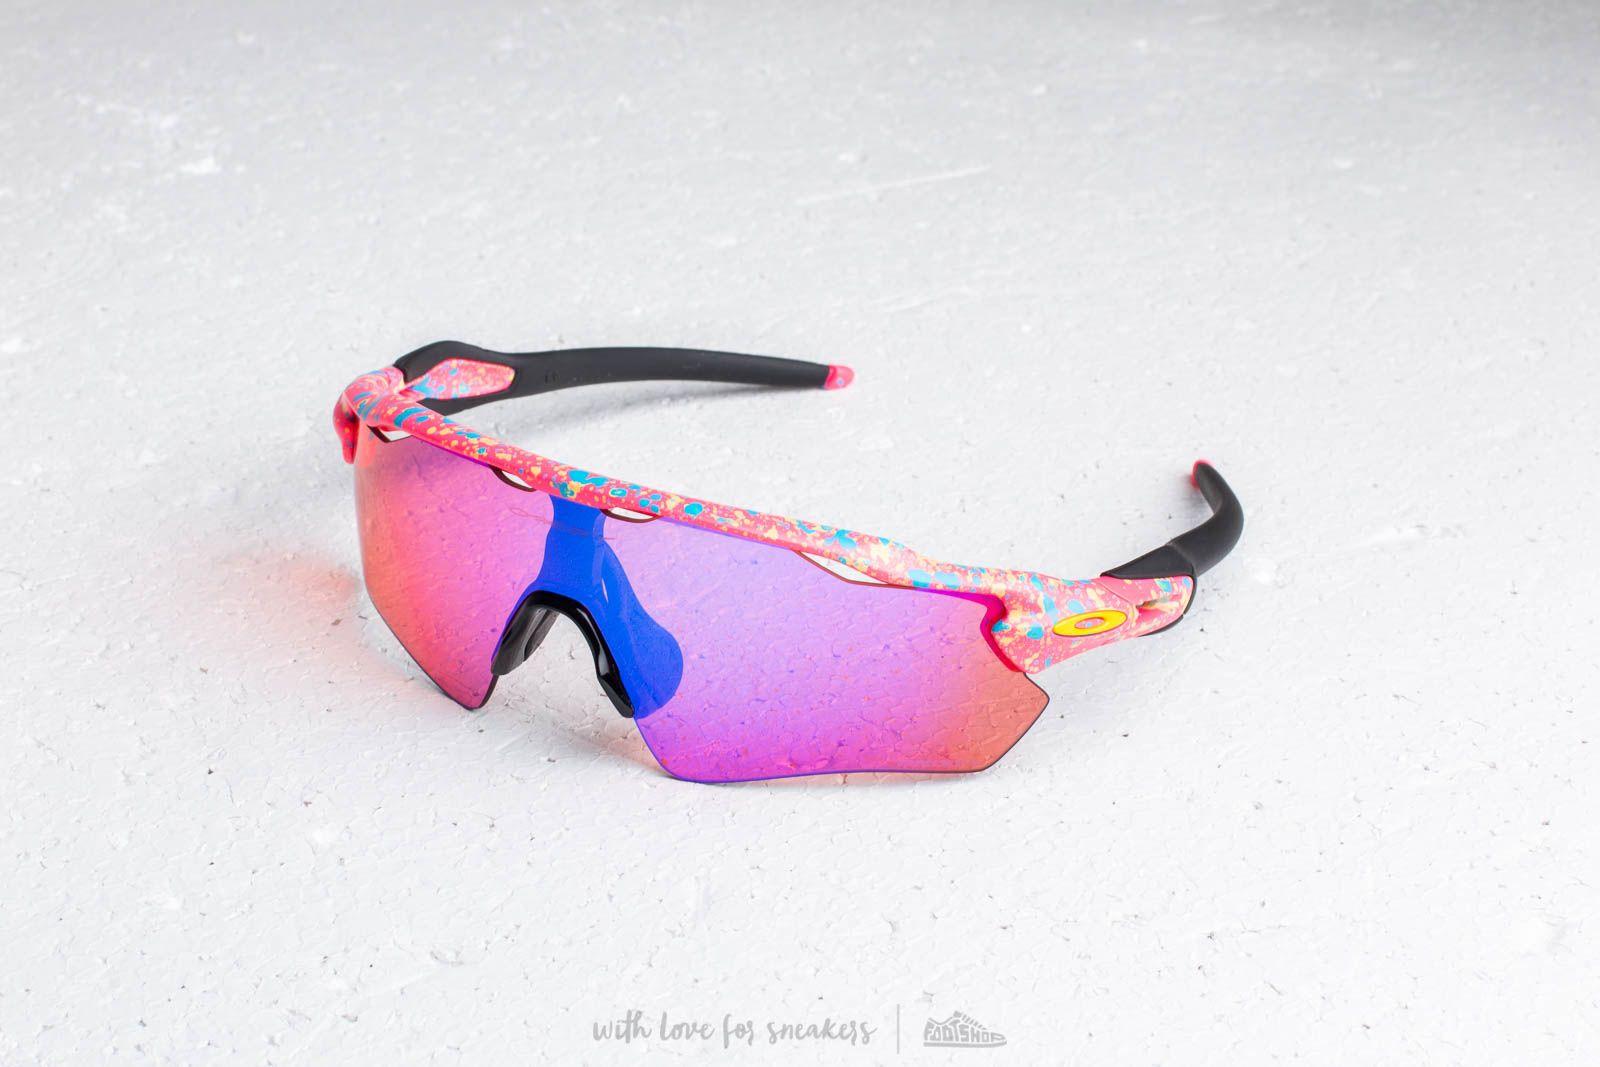 Oakley Radar Splatterfade Sunglasses Pink at a great price $206 buy at Footshop